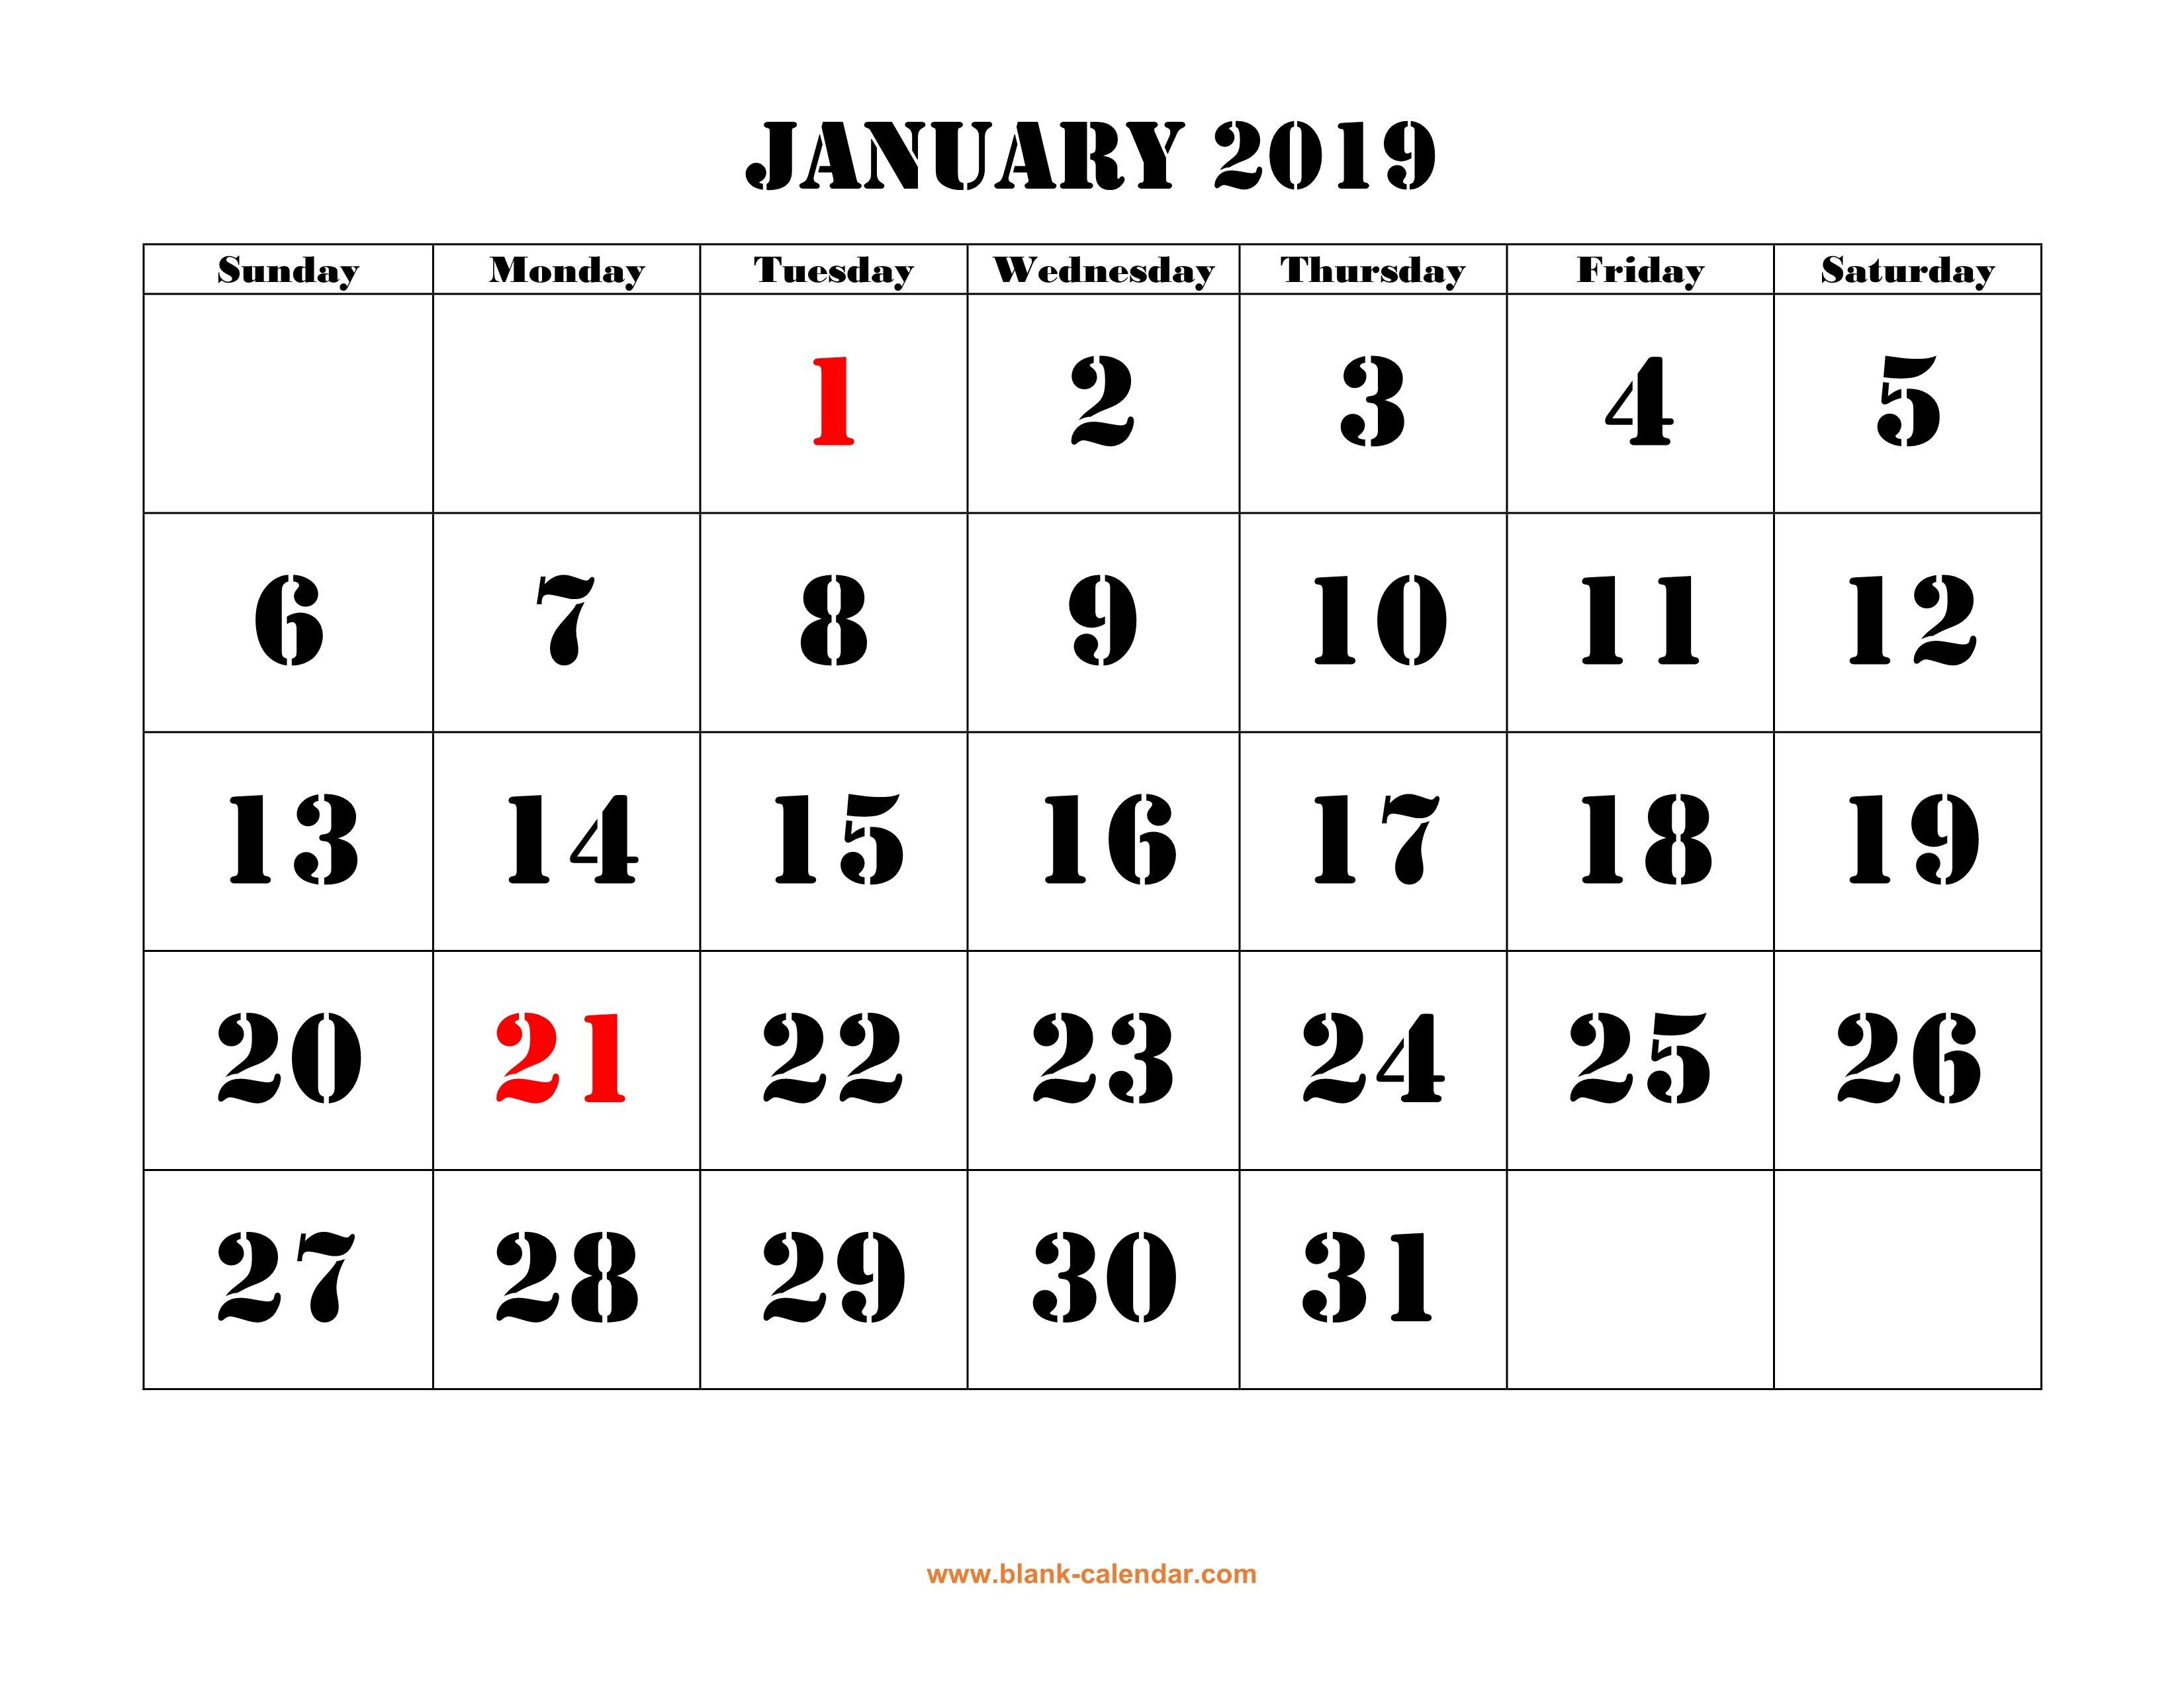 Free Download Printable January 2019 Calendar, Large Font Design Calendar 2019 Jan Feb